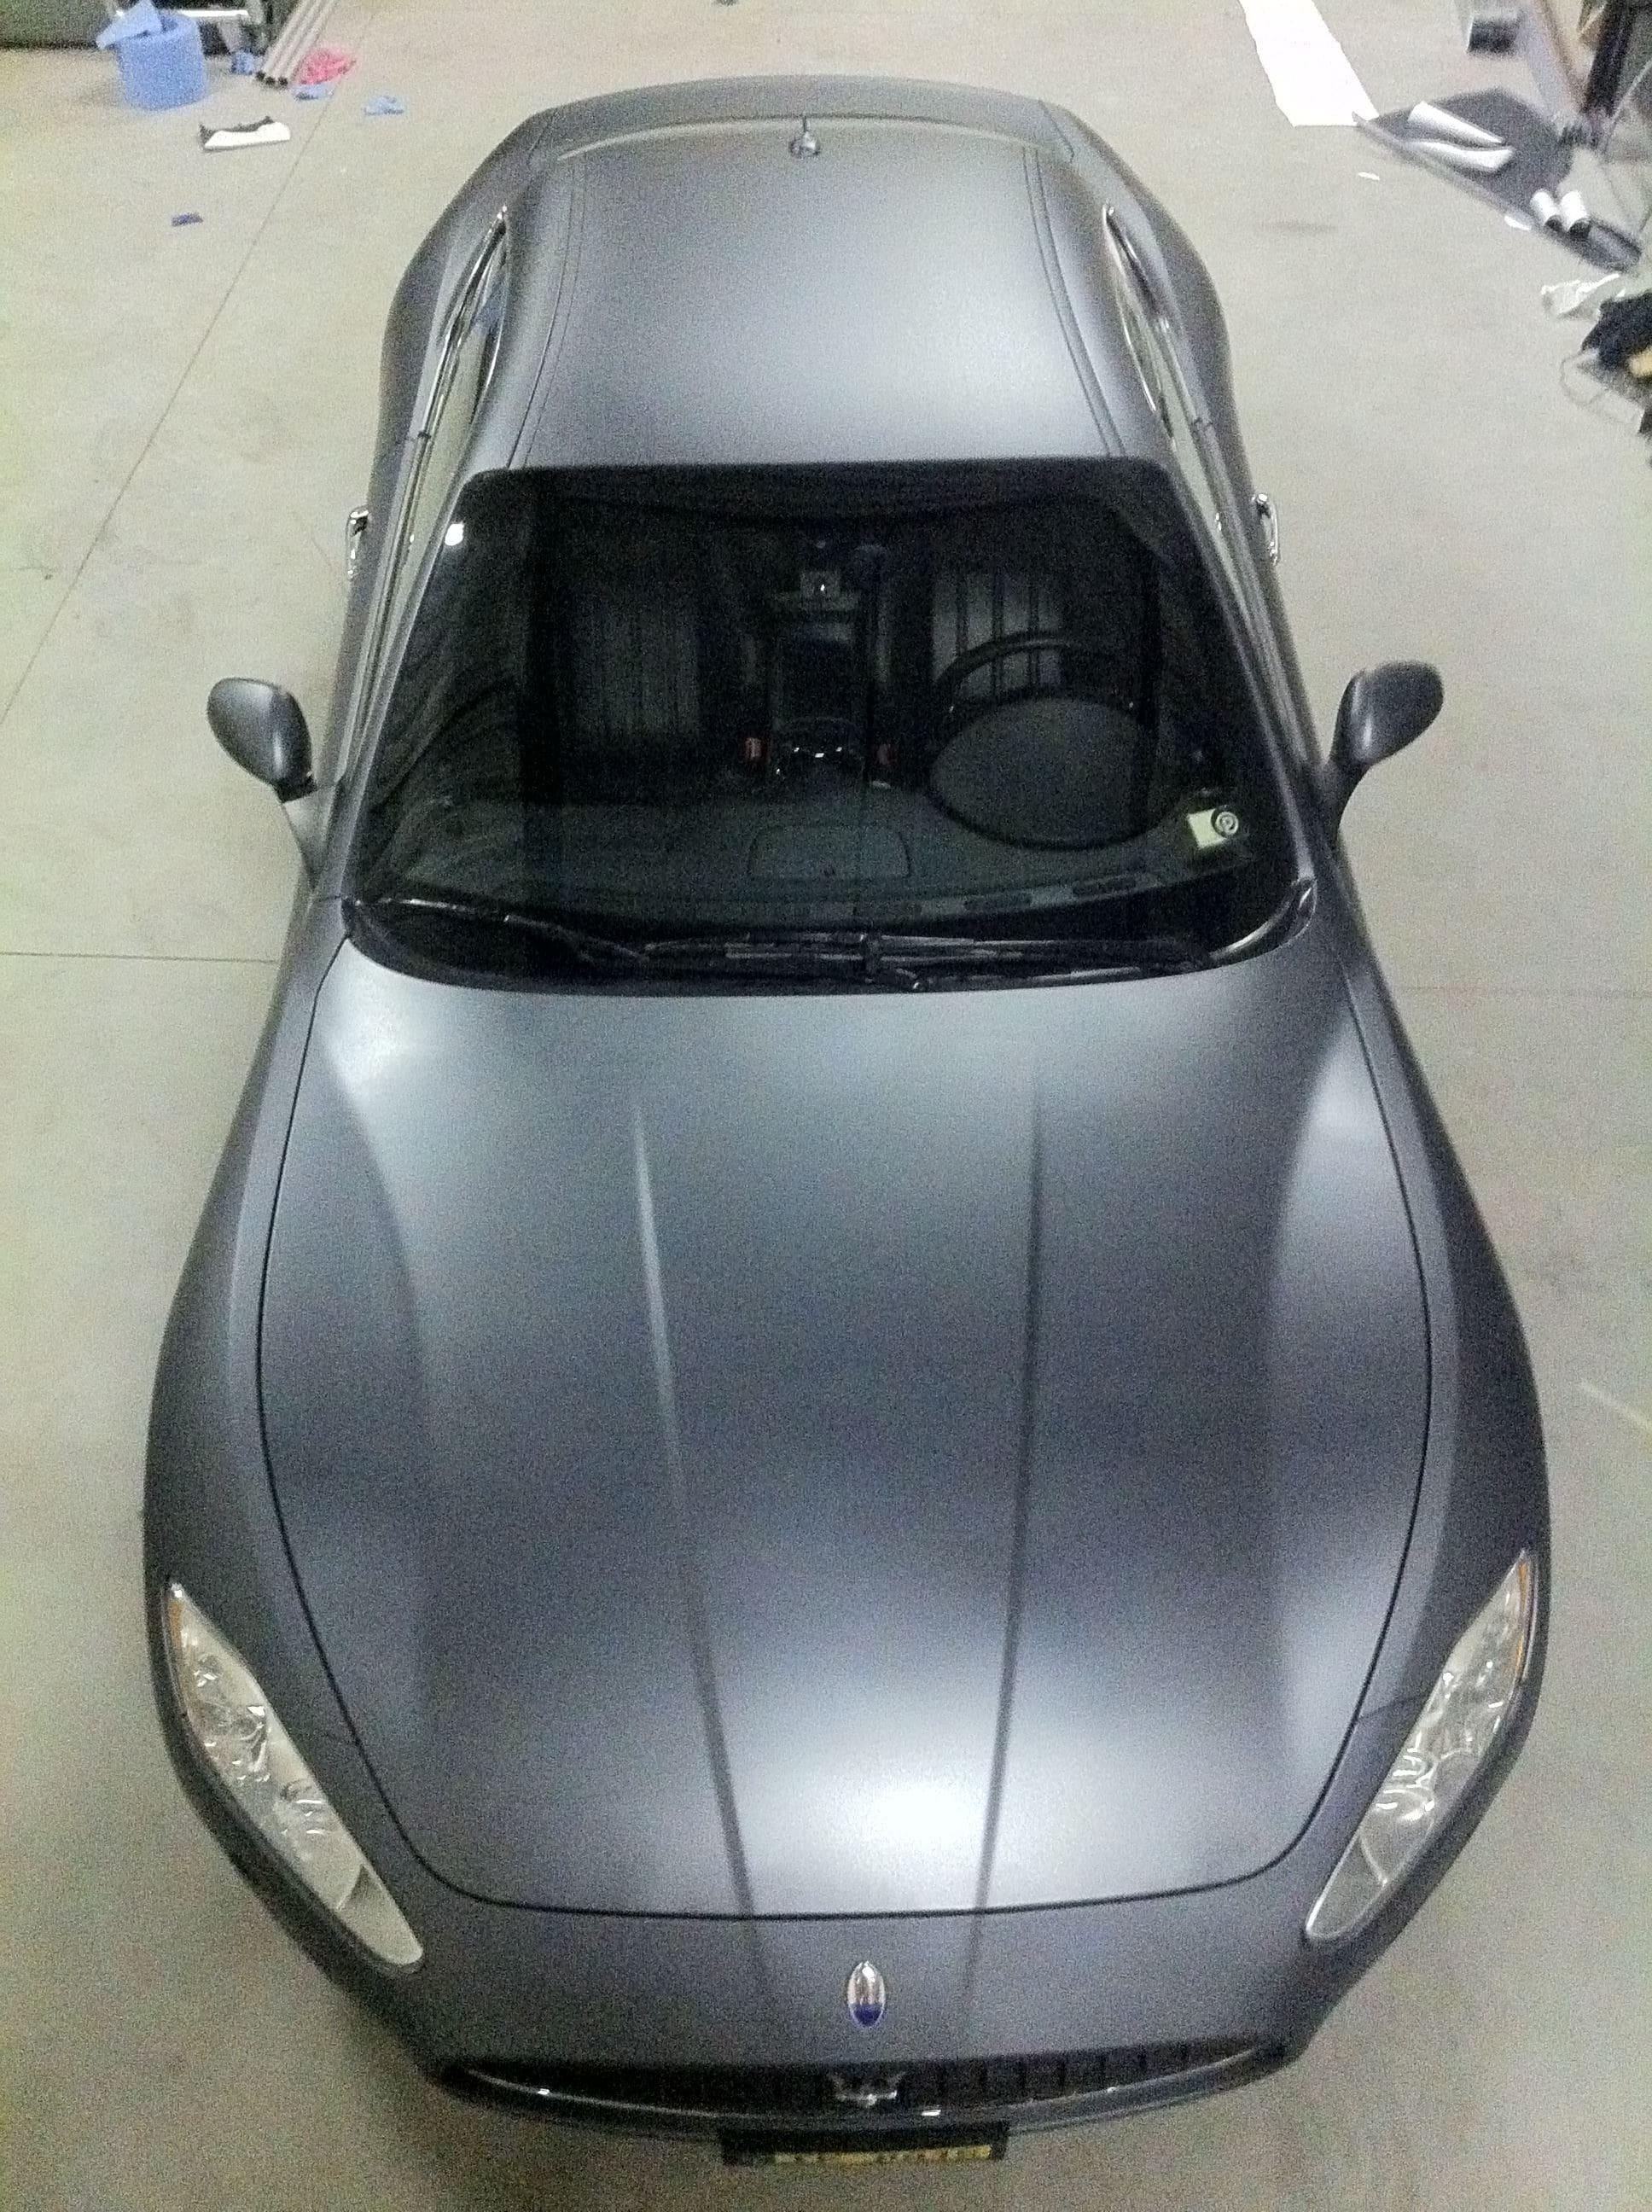 Maserati Gran Turismo met Mat Zwarte Wrap, Carwrapping door Wrapmyride.nu Foto-nr:6037, ©2020